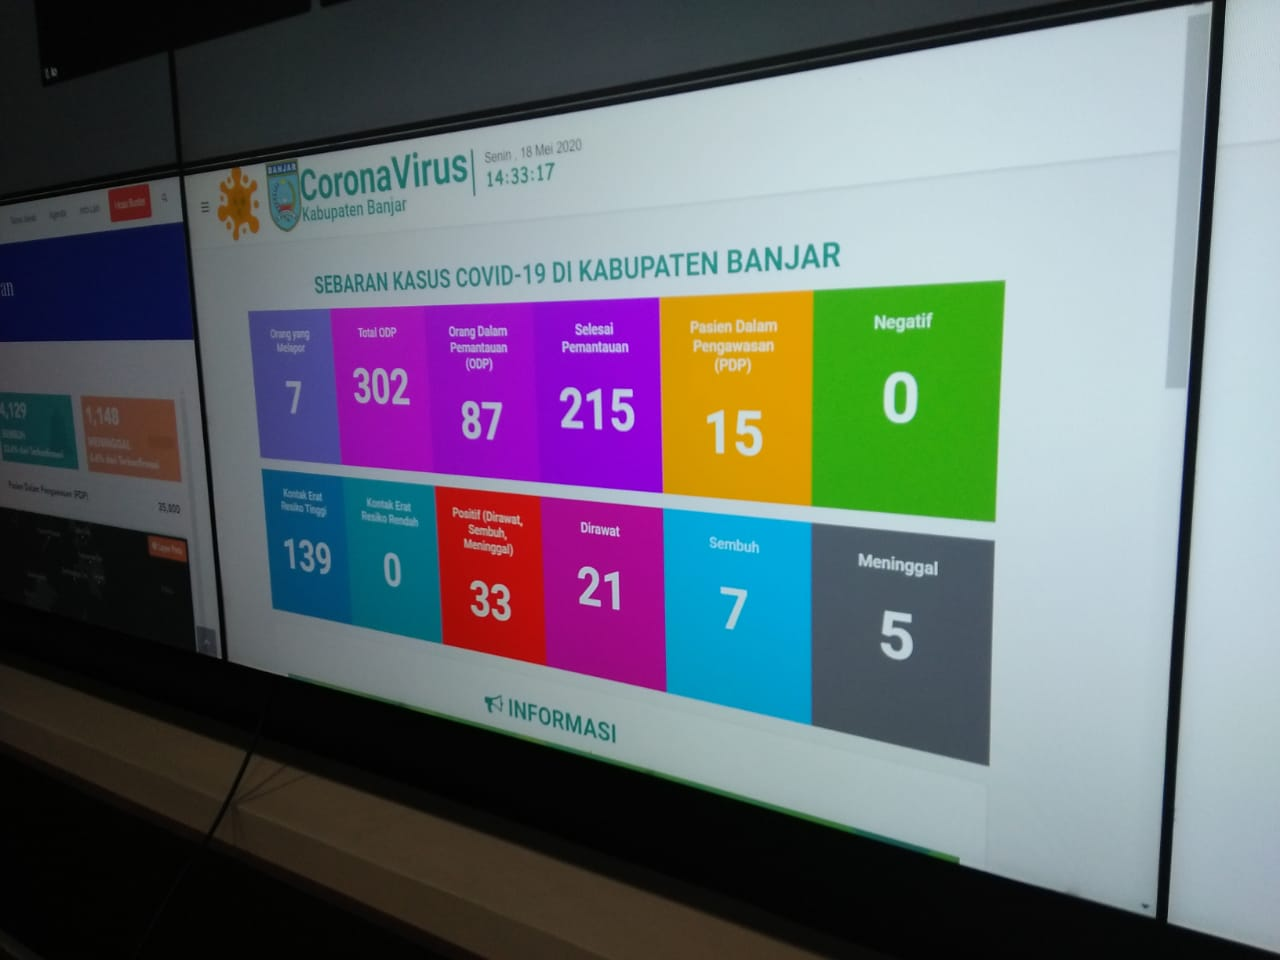 Gugus Tugas Covid-19 Banjar Minta Masyarakat Jangan Terkejut Kasus Meningkat Saat PSBB 6